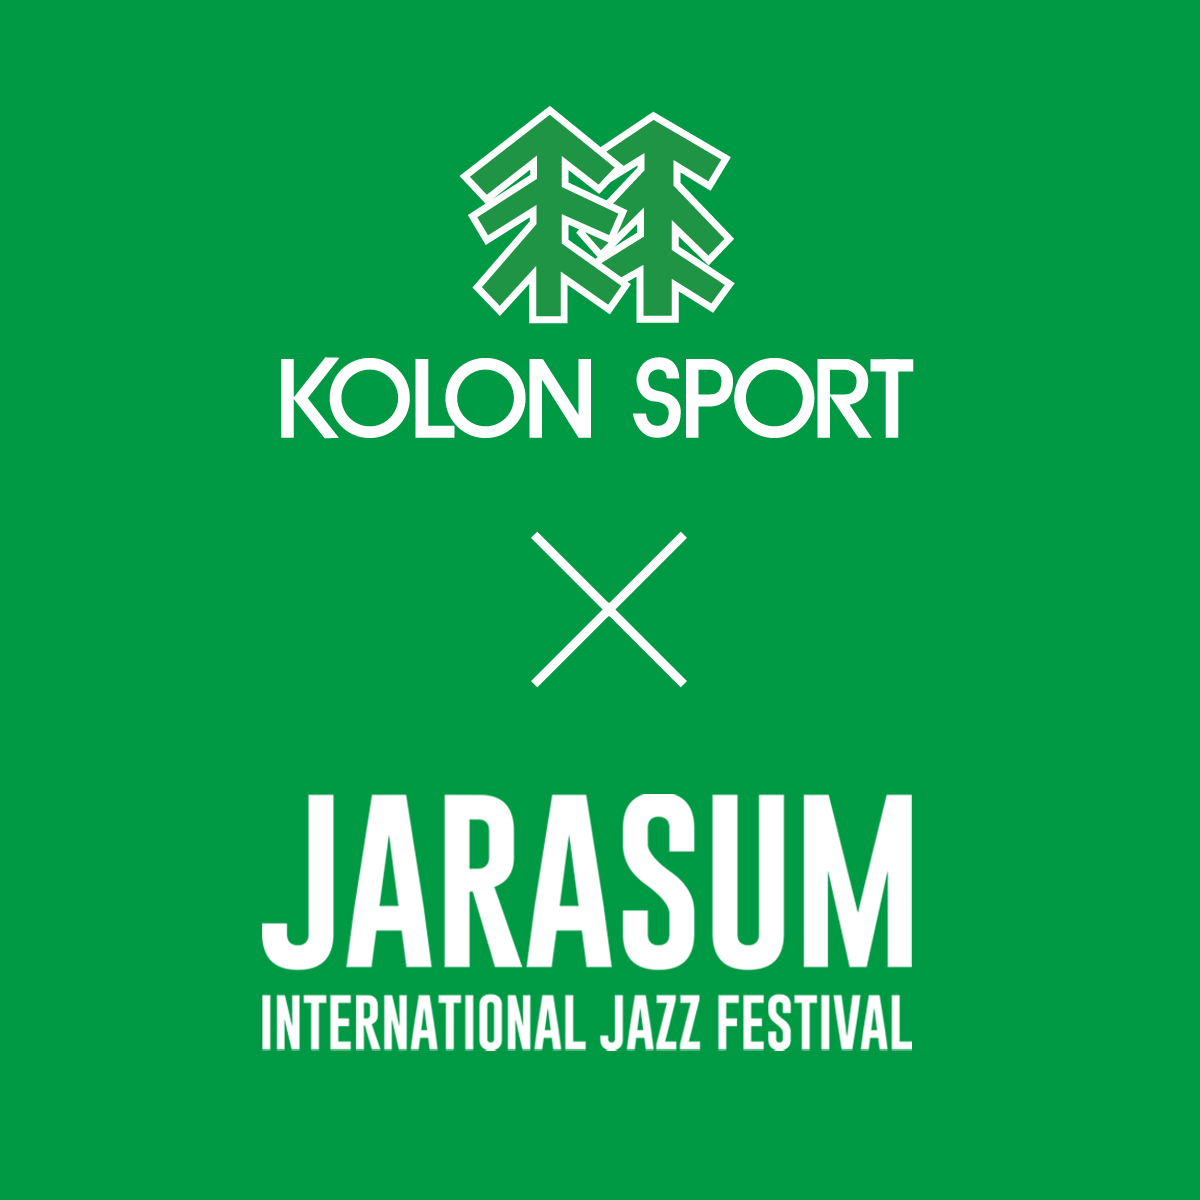 jarasum_left